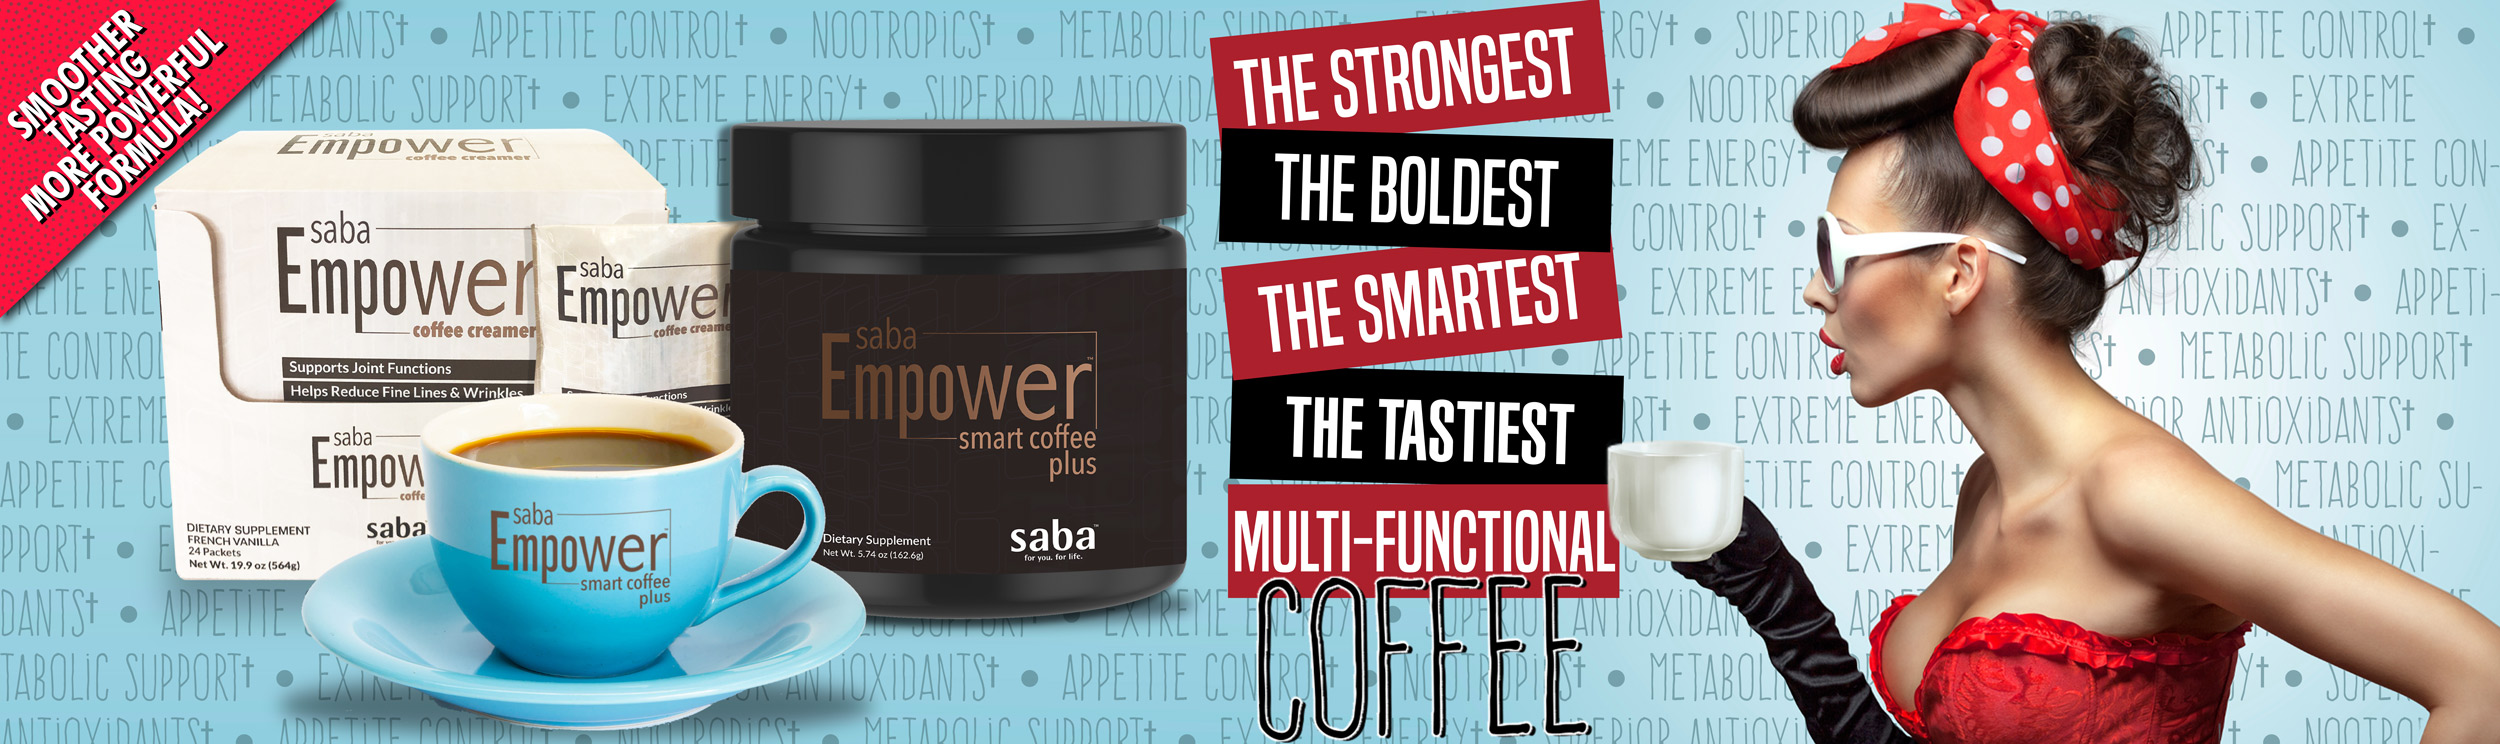 Saba empower smart coffee plus fo 01 2500x744